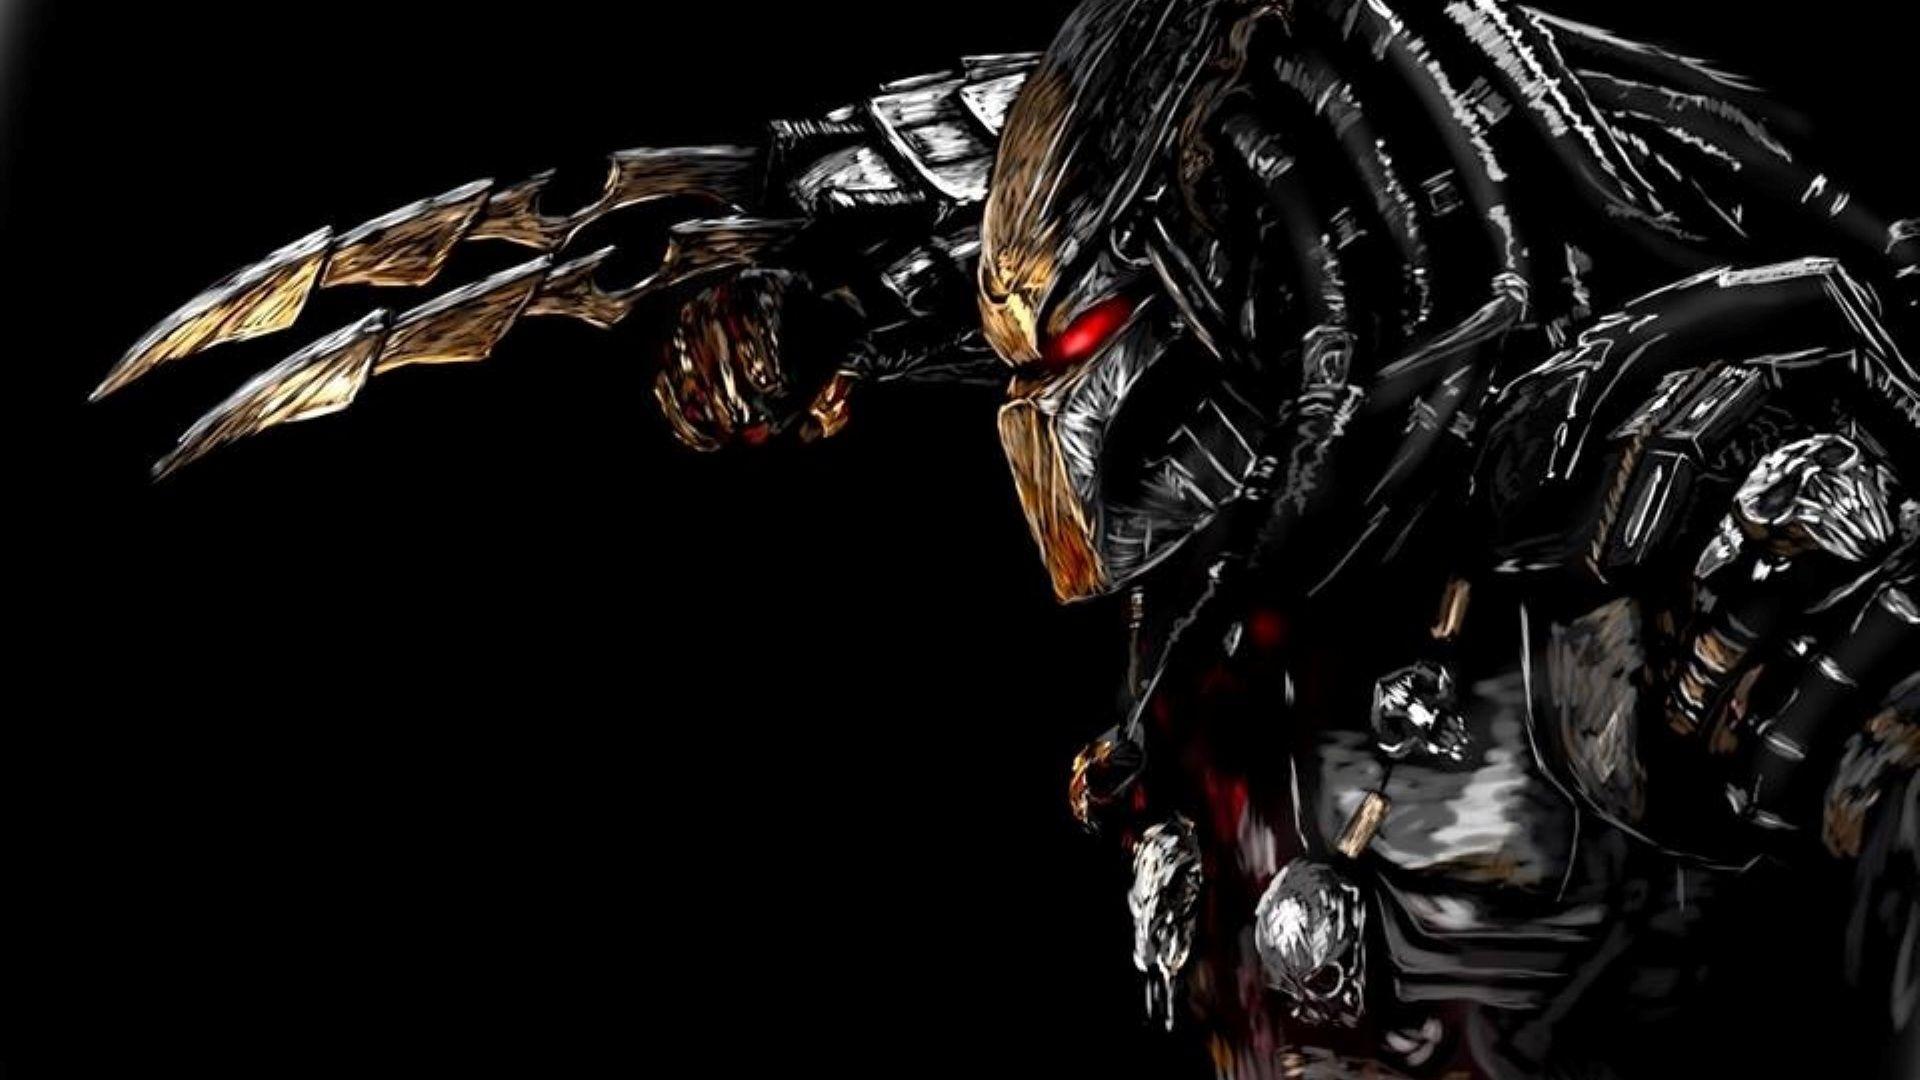 Predator 2018 4k Wallpapers: Top Free Predator Backgrounds